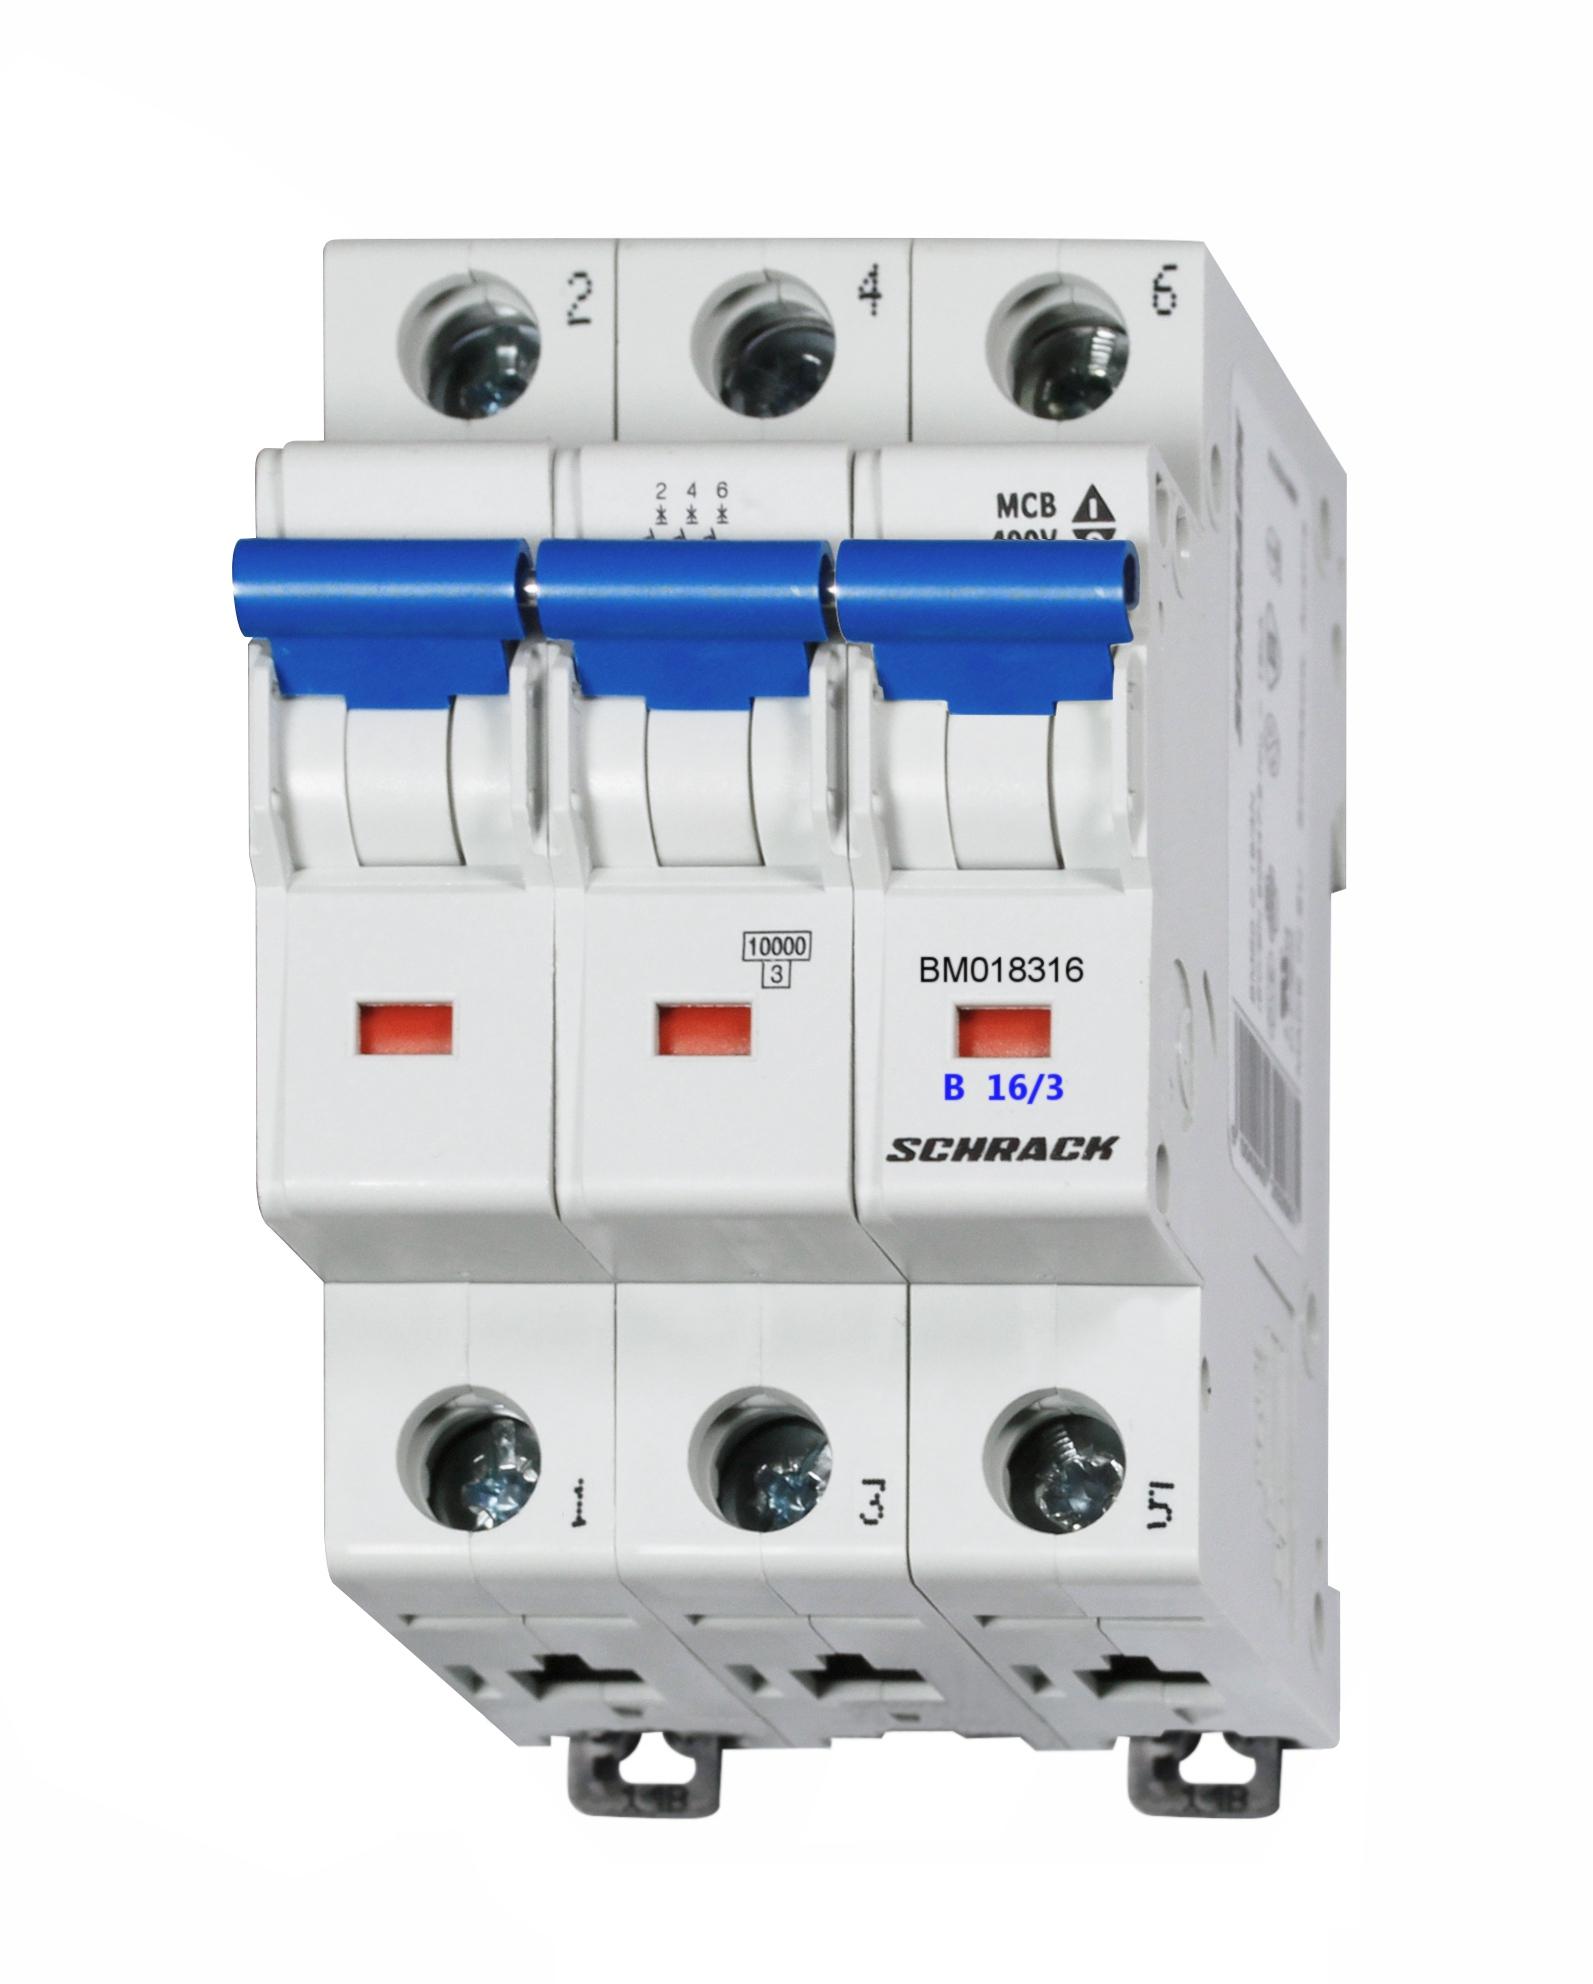 BM018316 - Schrack Technik